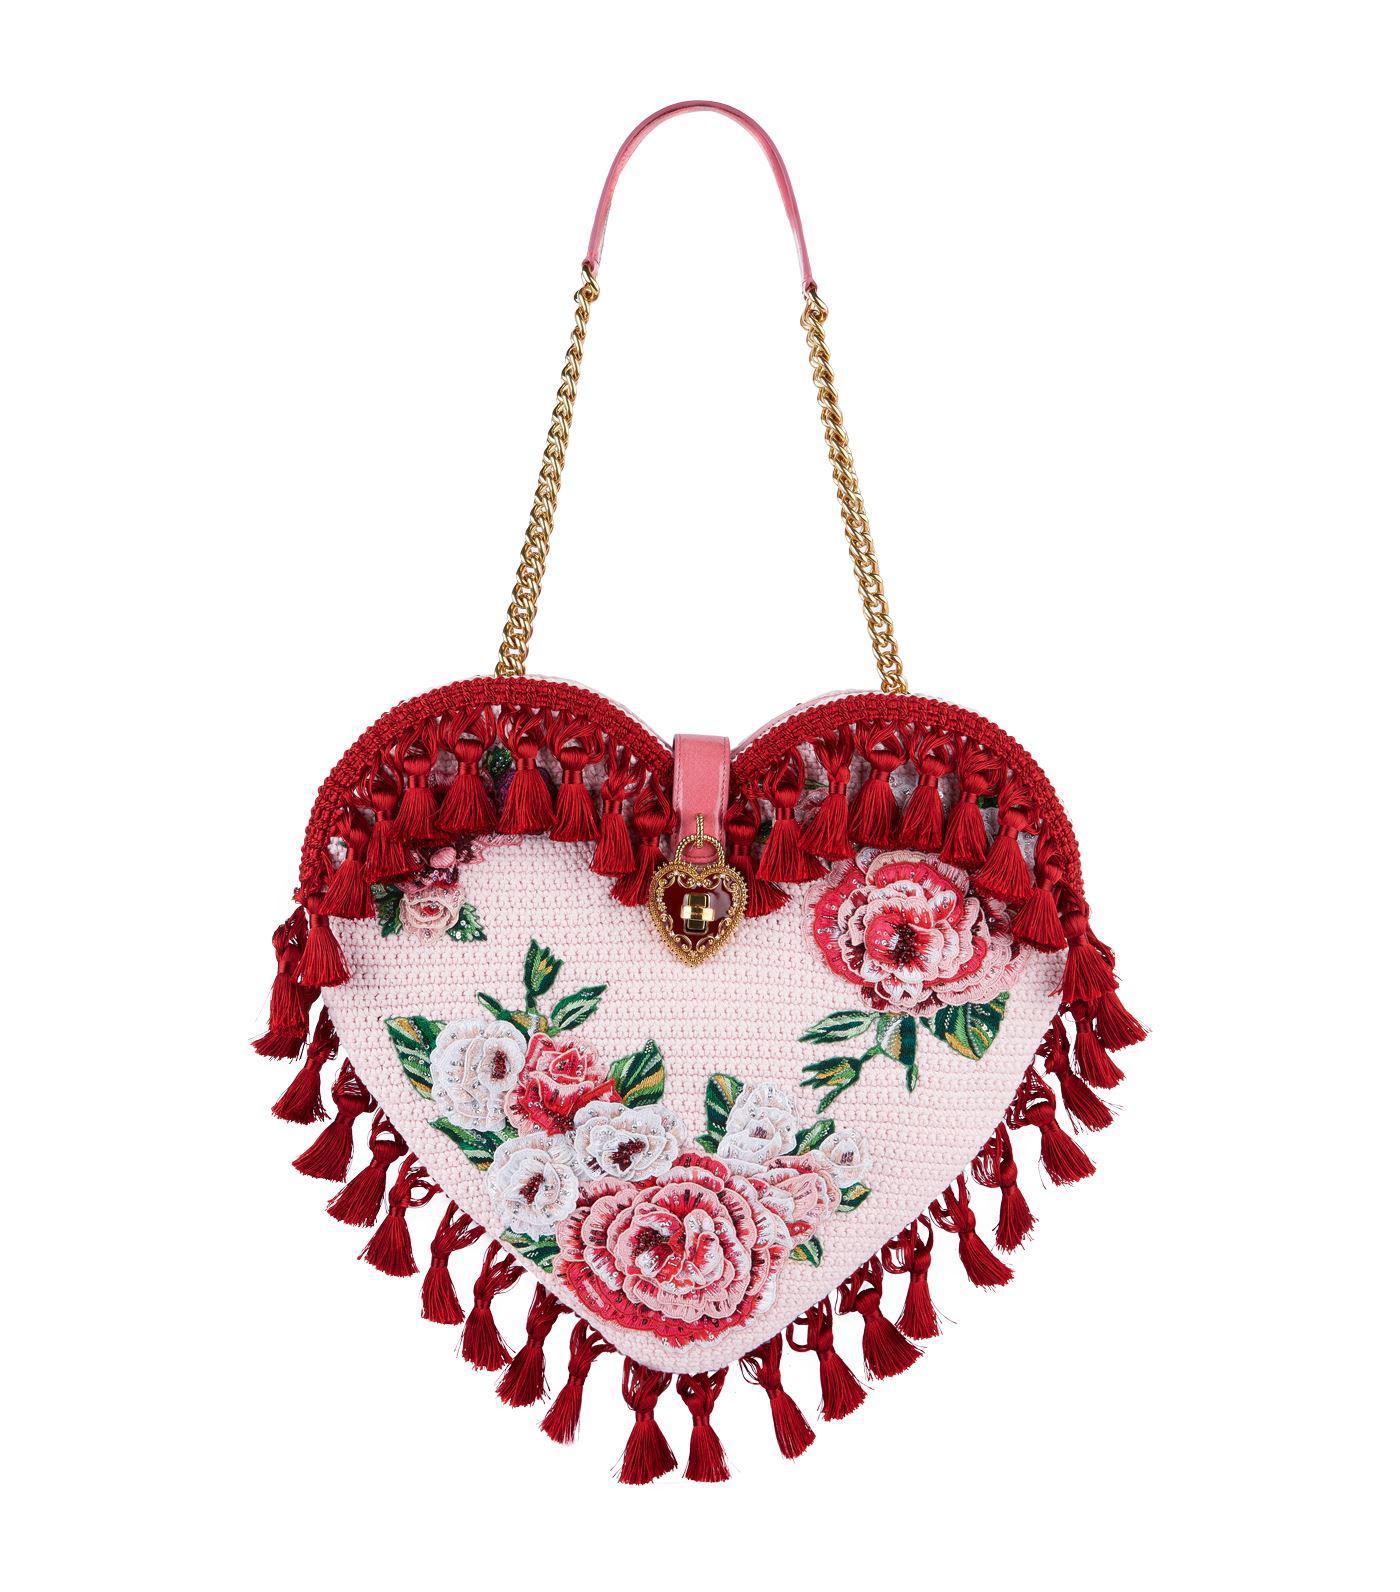 Dolce   Gabbana My Heart Embellished Crochet Bag in Red - Lyst 4da46f364cdc8